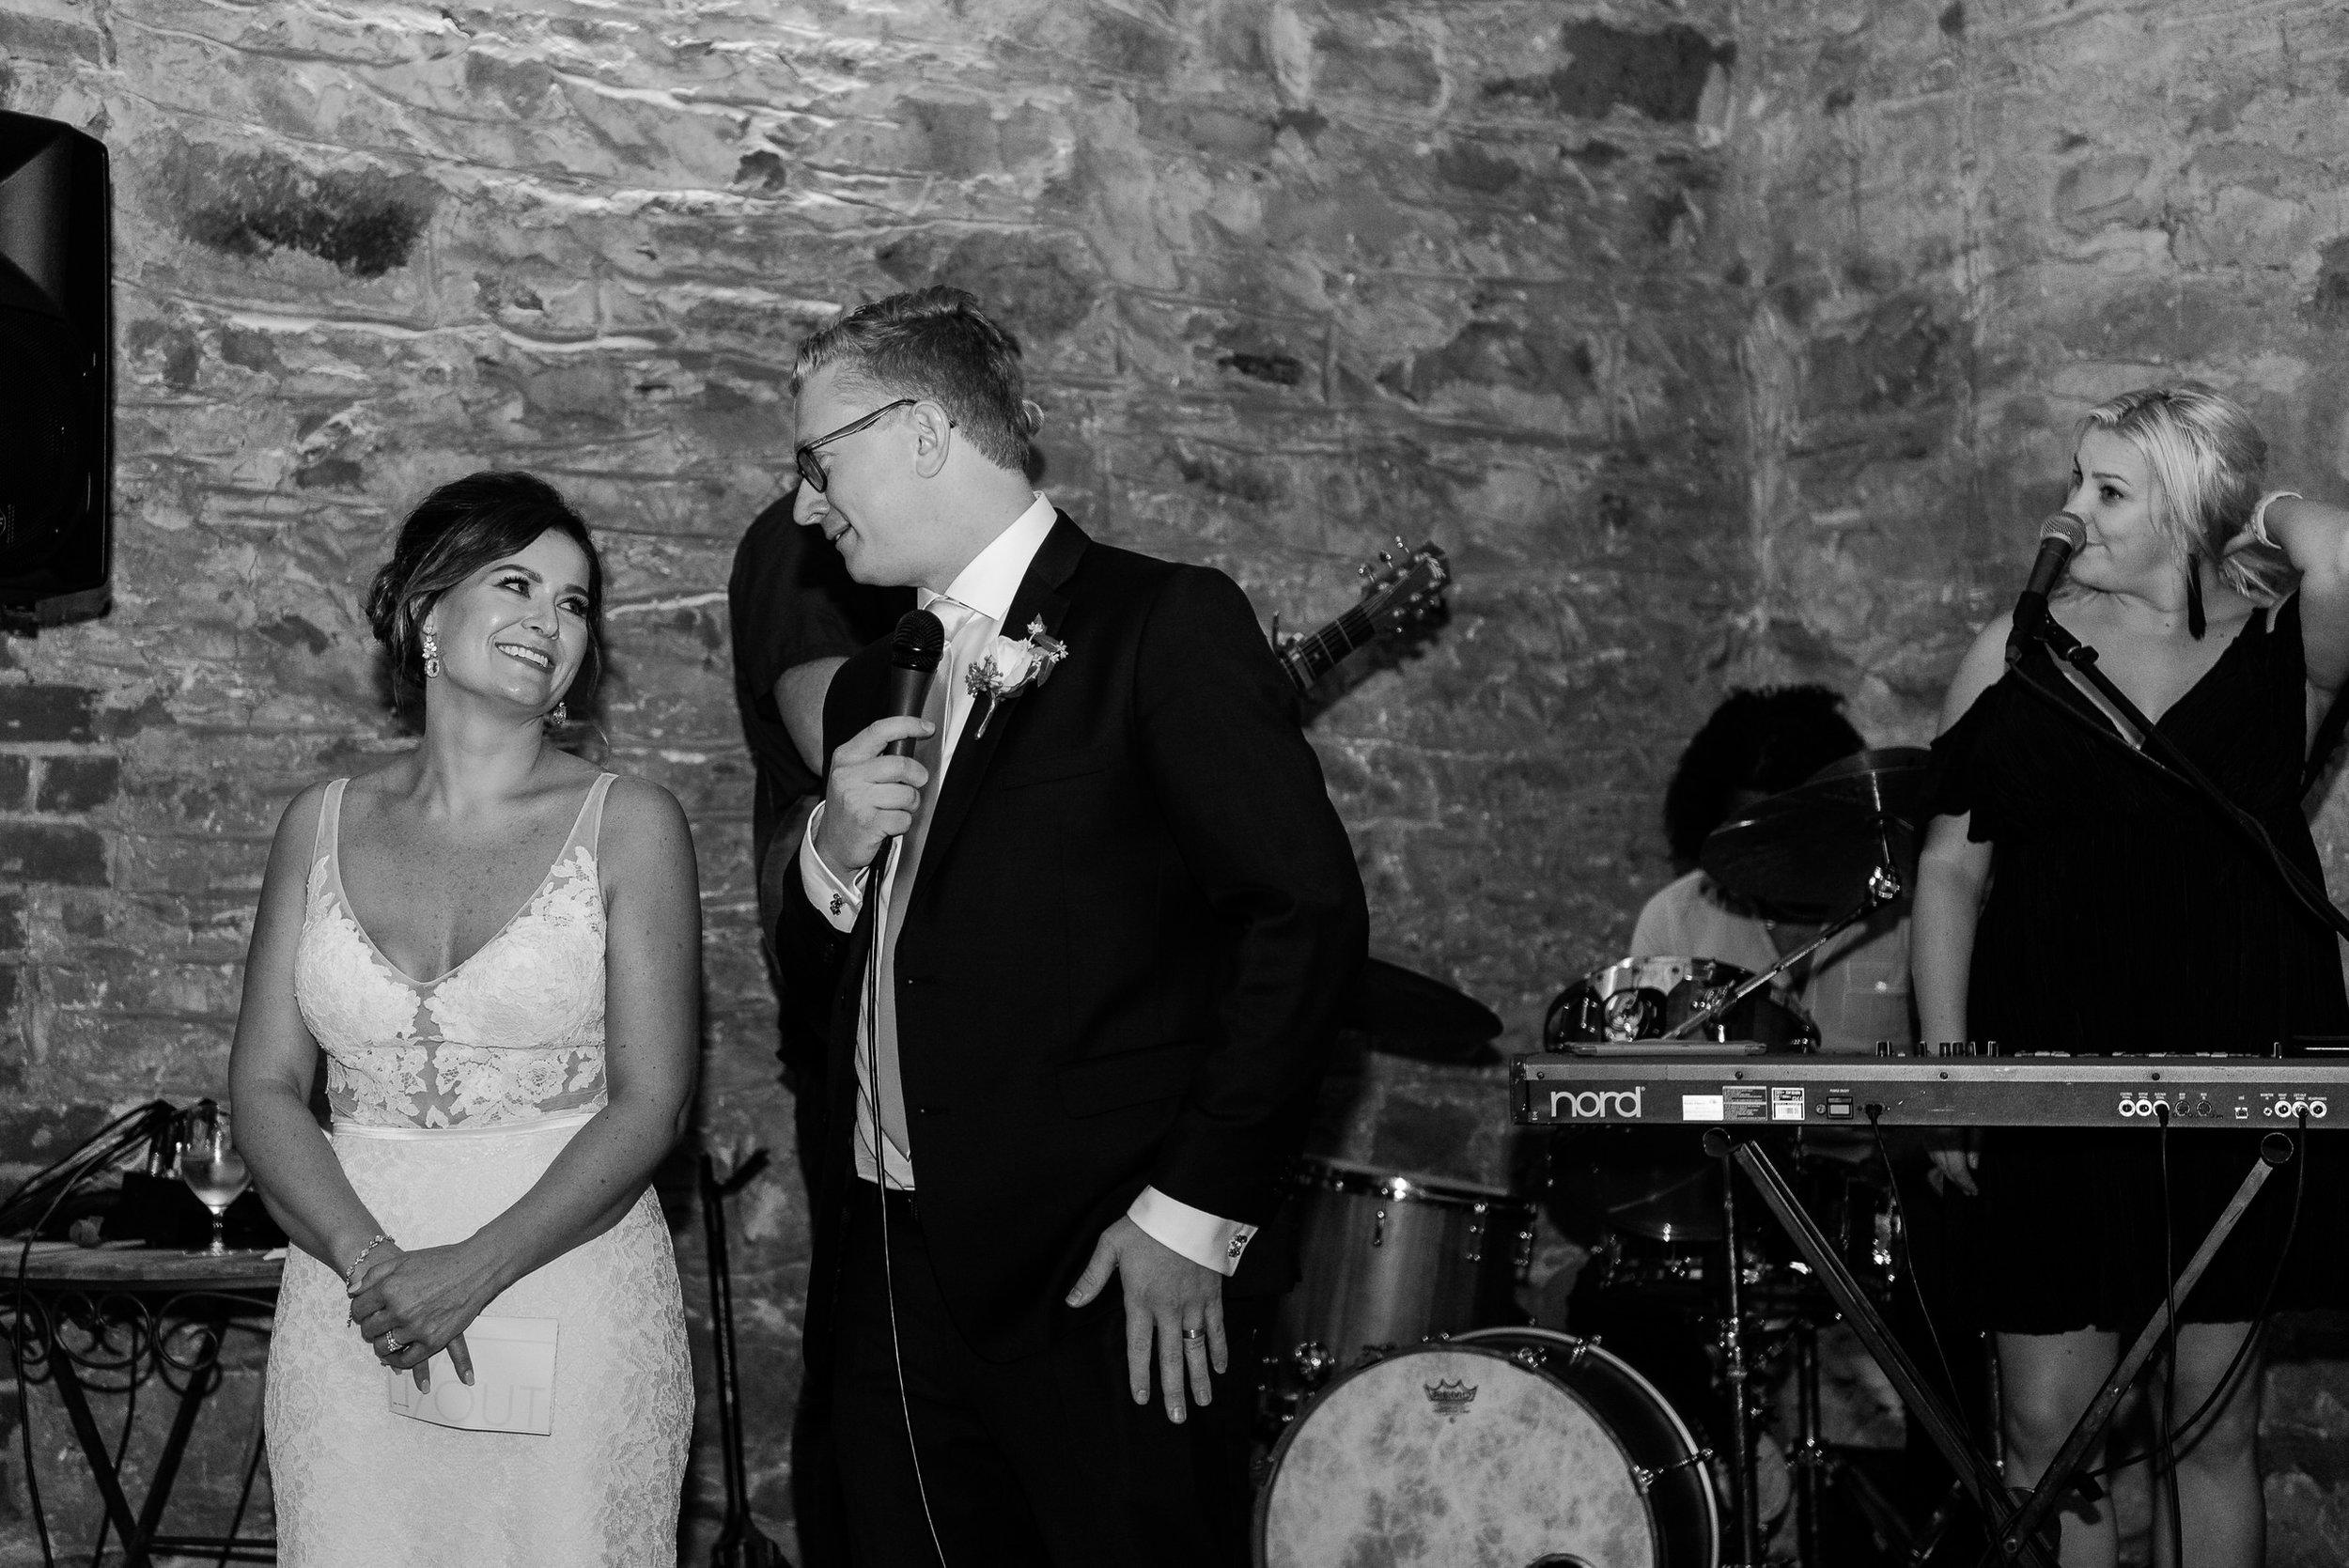 Justin_And_Jim_Photography_Chateau_Dore_Bendigo_Wedding92.JPG